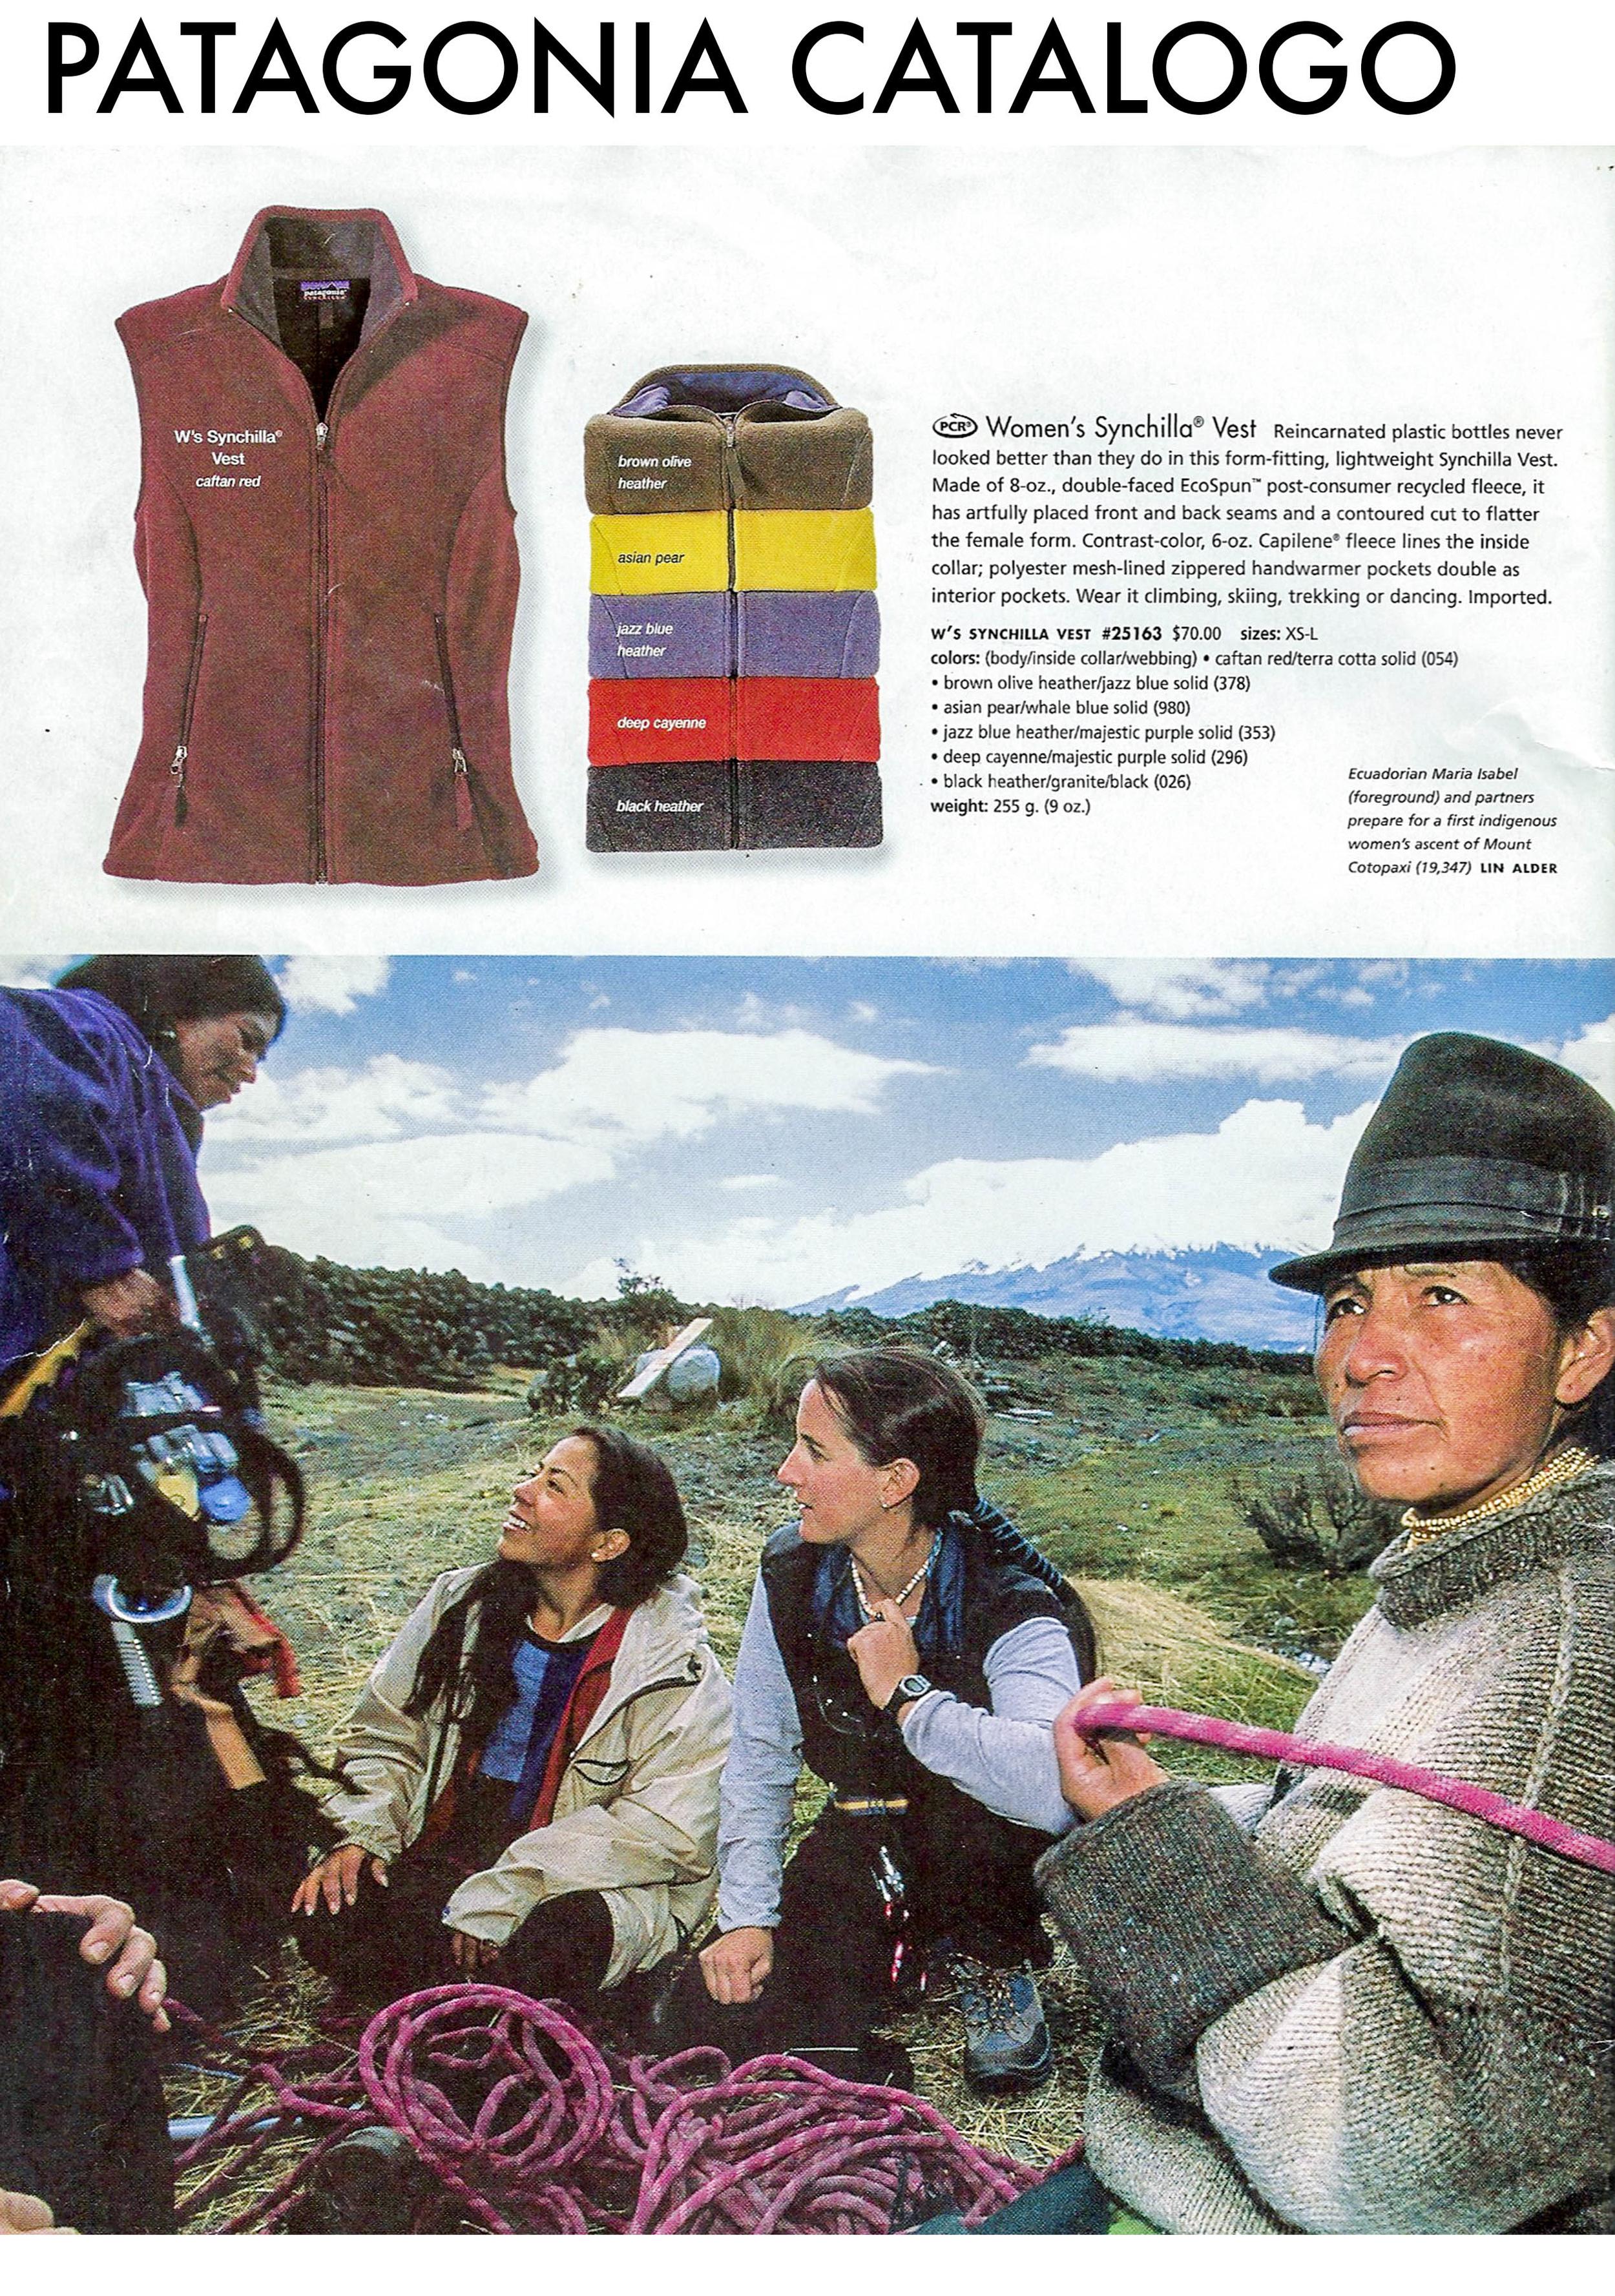 PatagoniaCatalogo.jpg